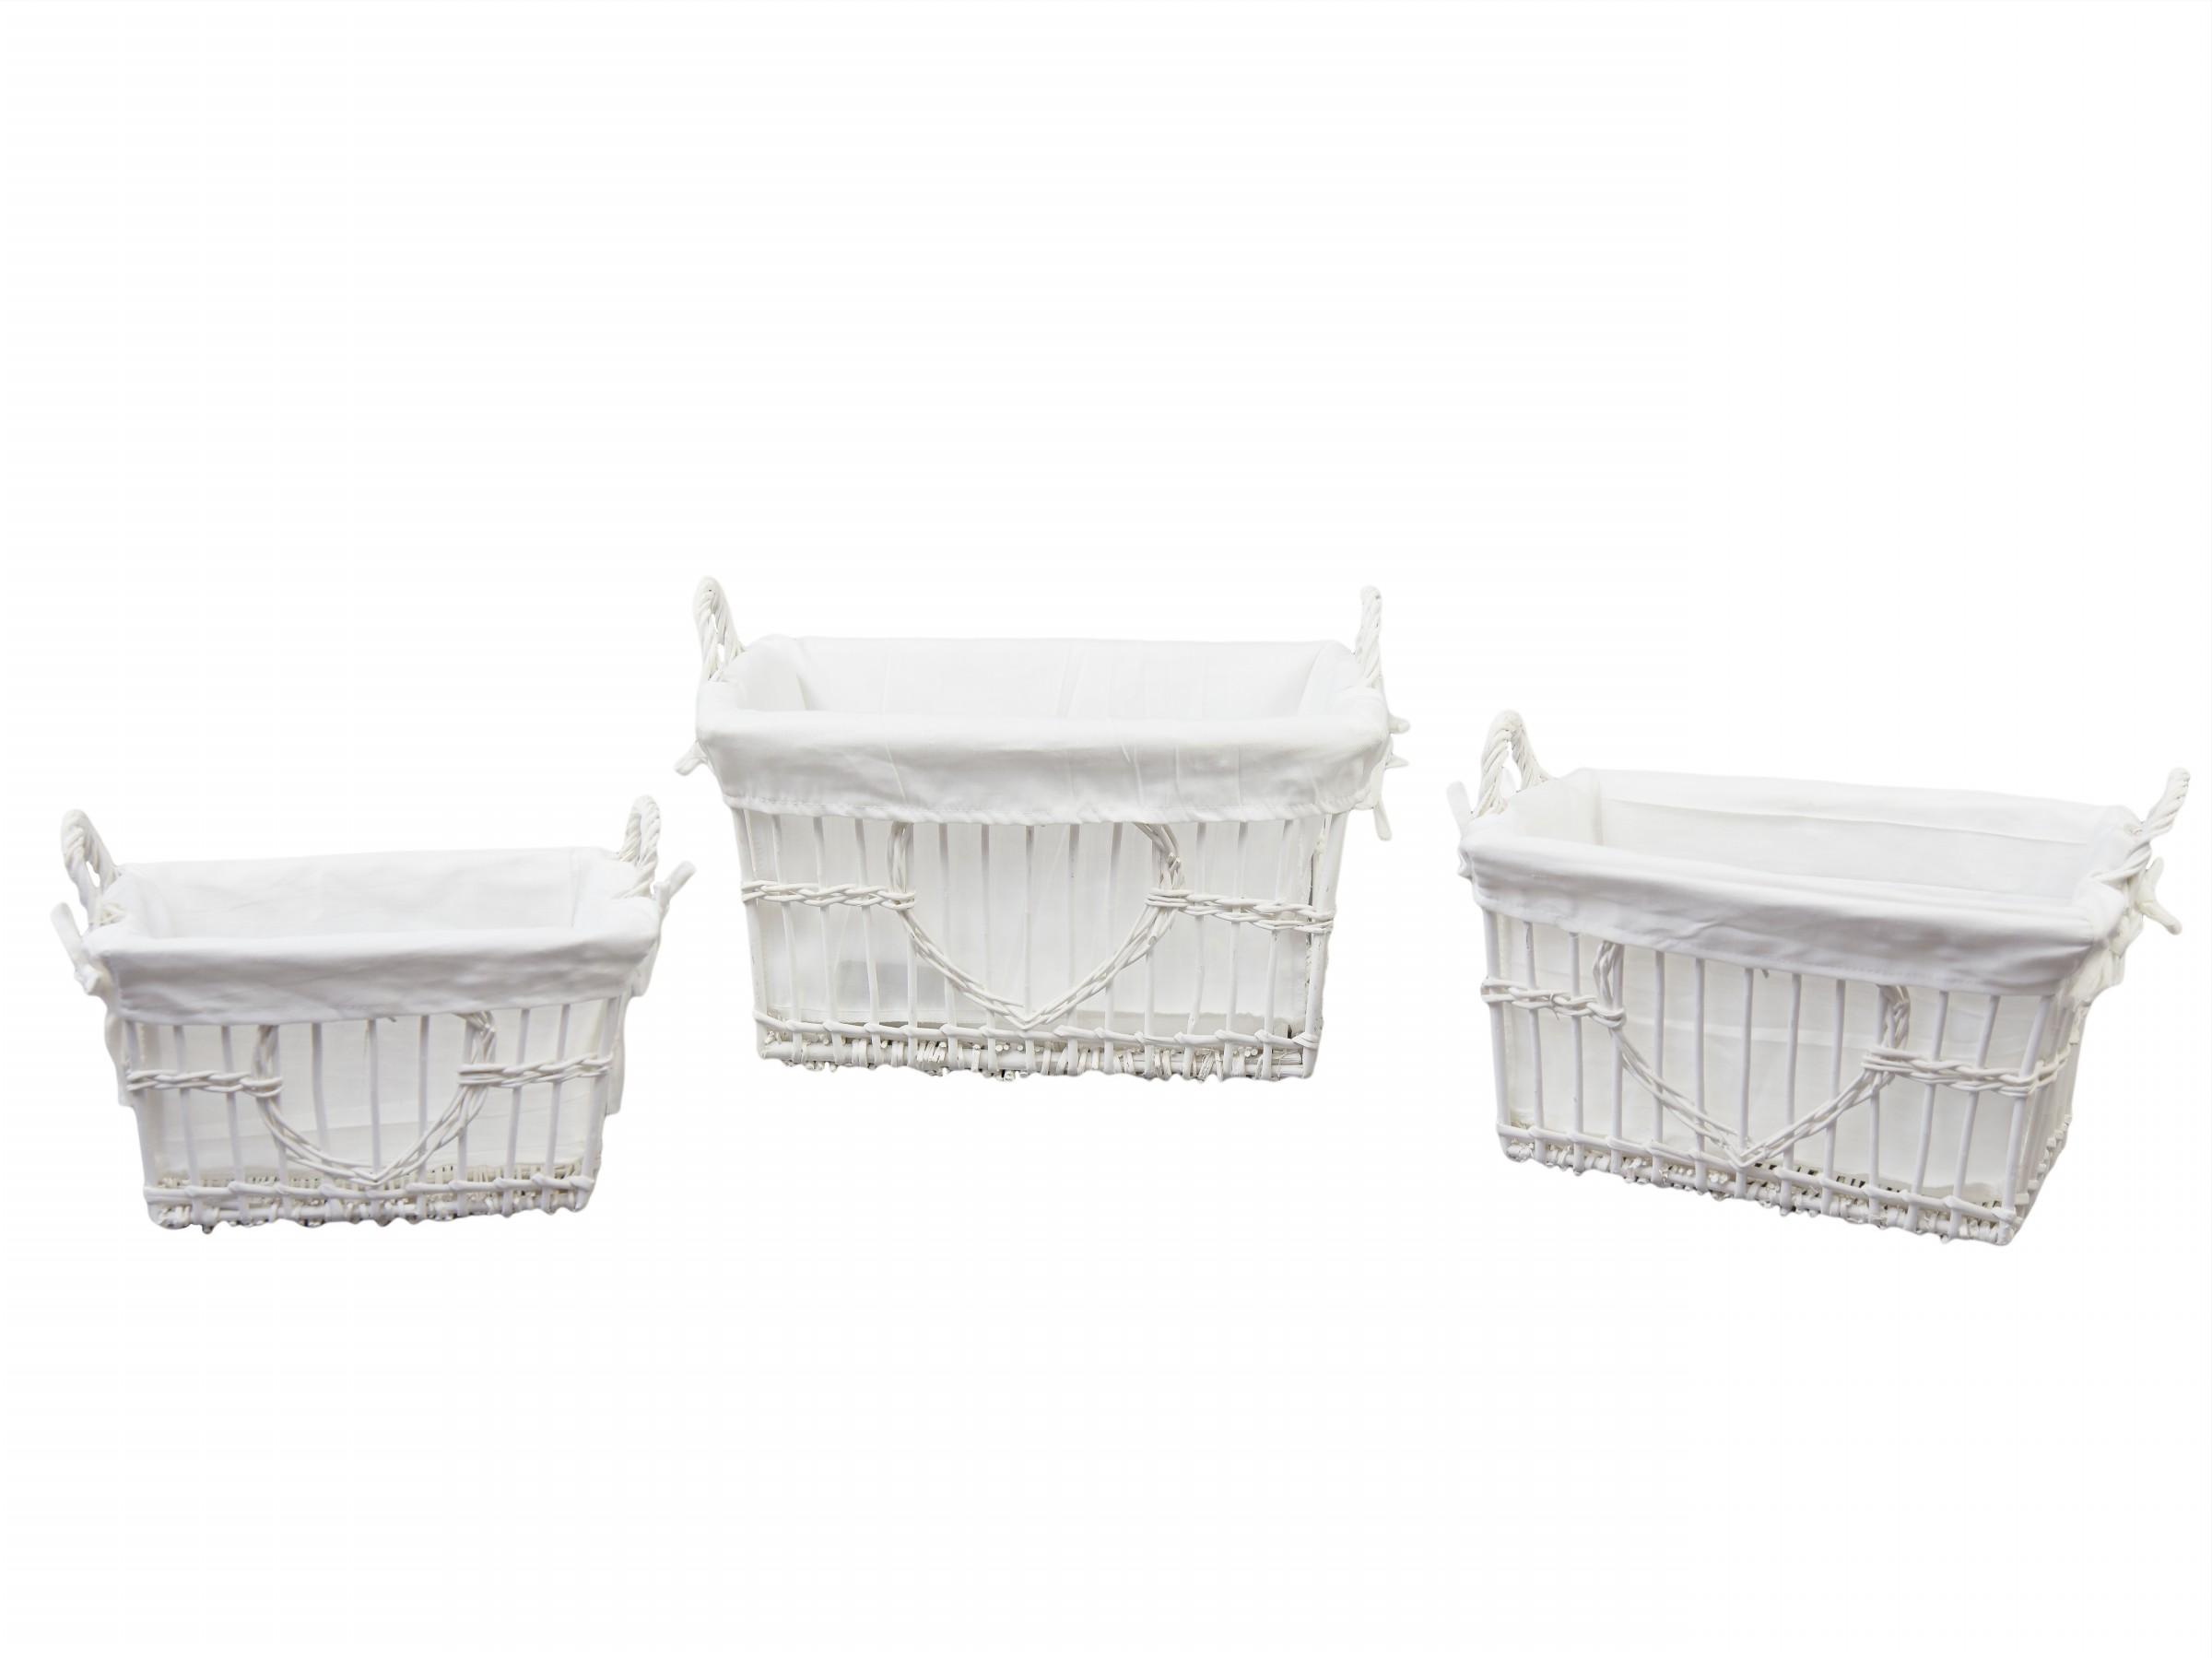 Proutěné koše bílé set 3ks Tvar: hranatý